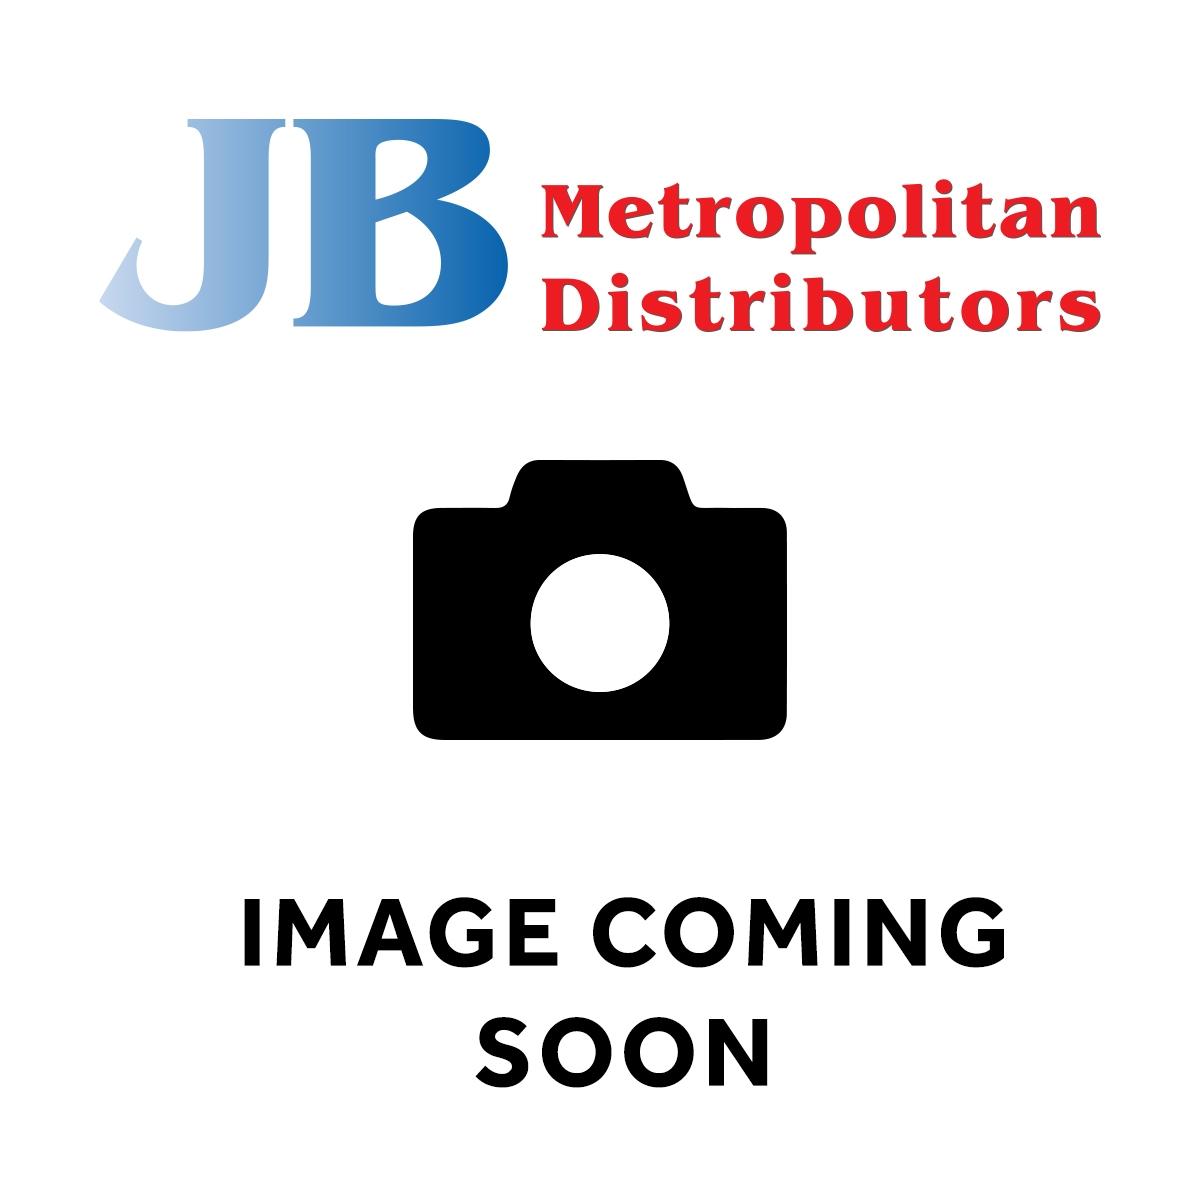 137G OREO STRAWBERRY